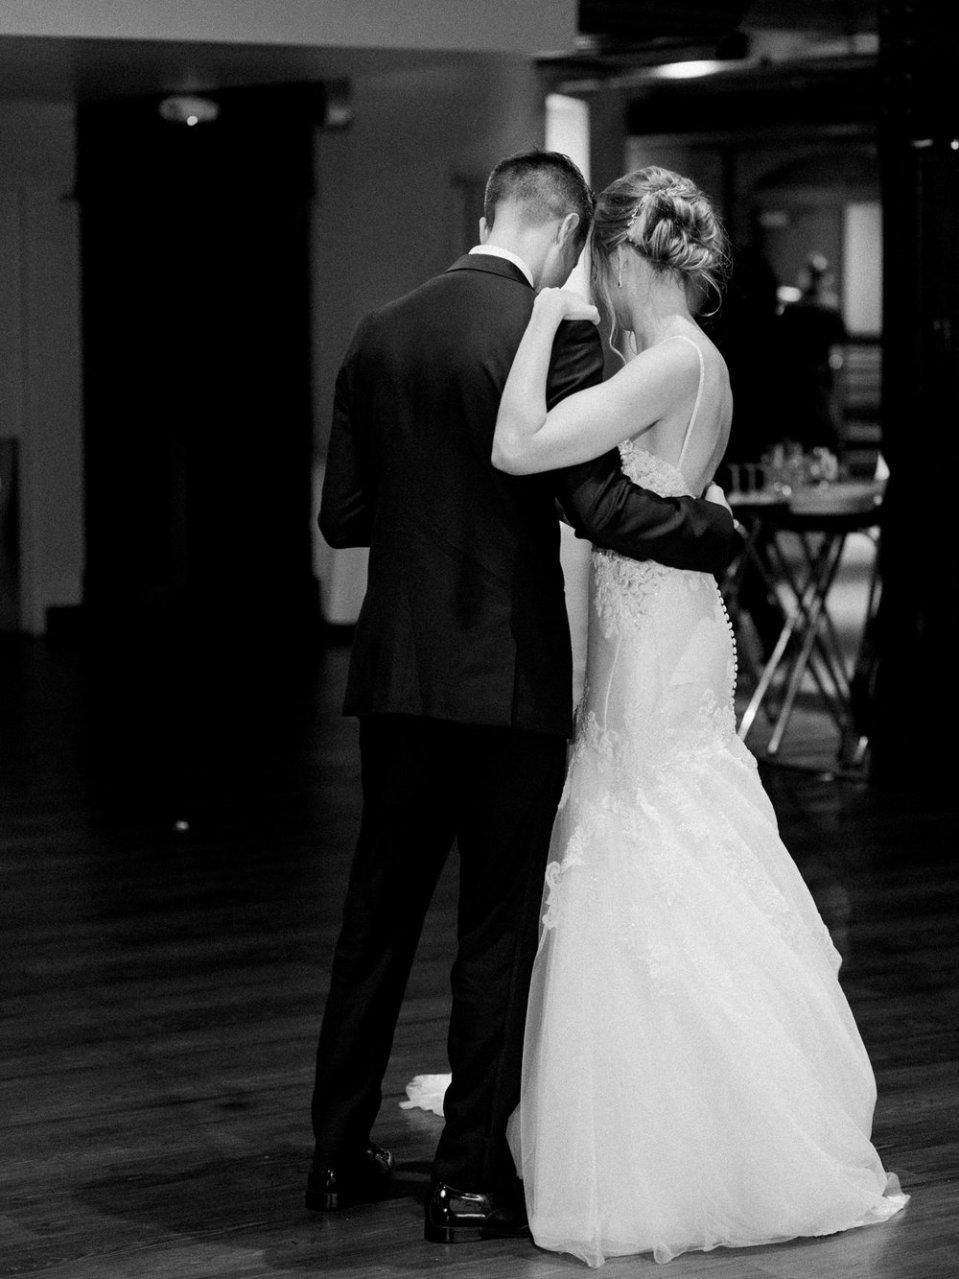 Romantic Wedding at the Cleveland Tudor Arms Hotel-63.jpg